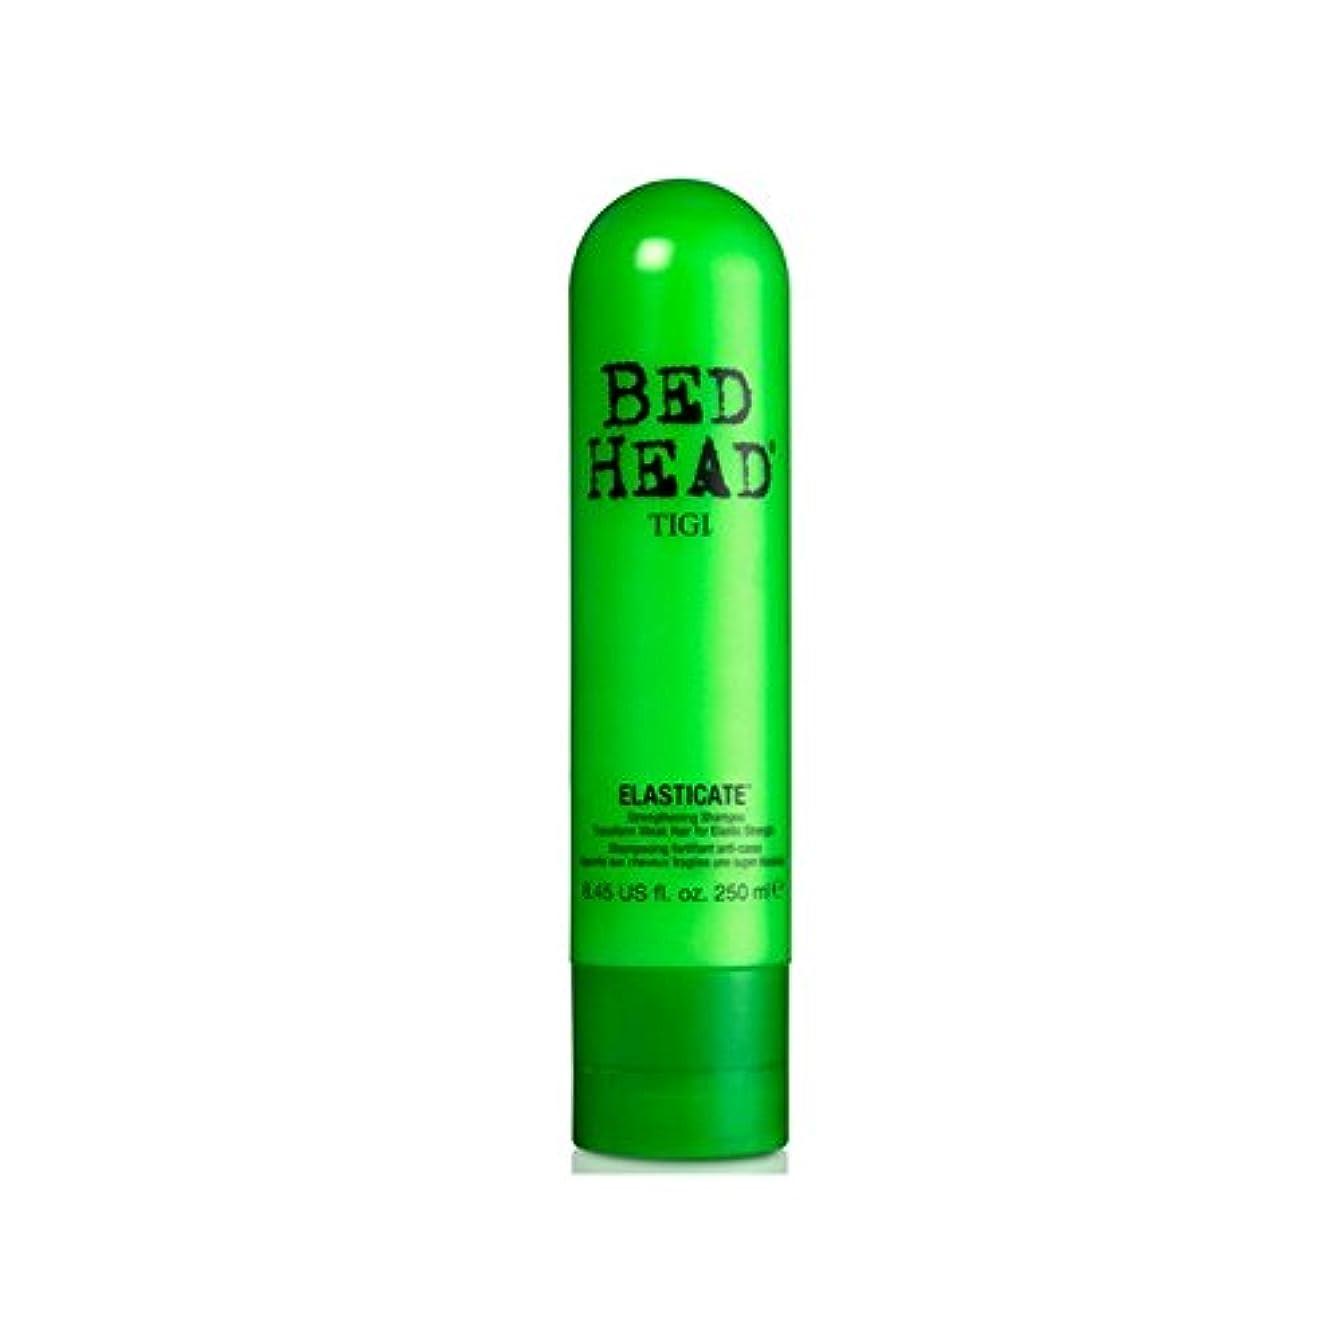 Tigi Bed Head Elasticate Shampoo (250ml) - ティジーベッドヘッドシャンプー(250ミリリットル) [並行輸入品]